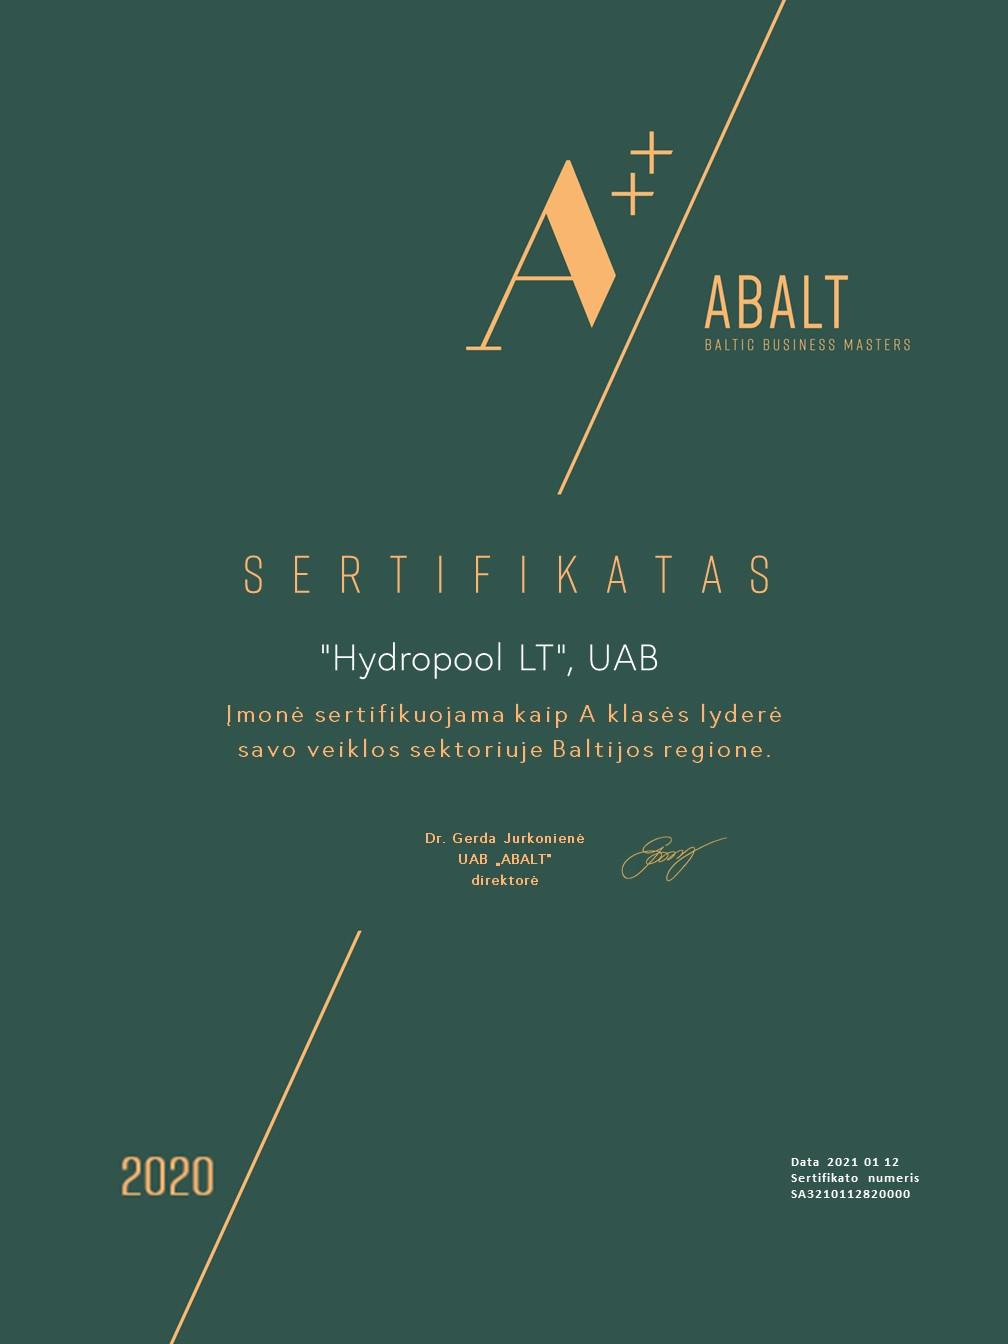 Abalt_Sertifikatas